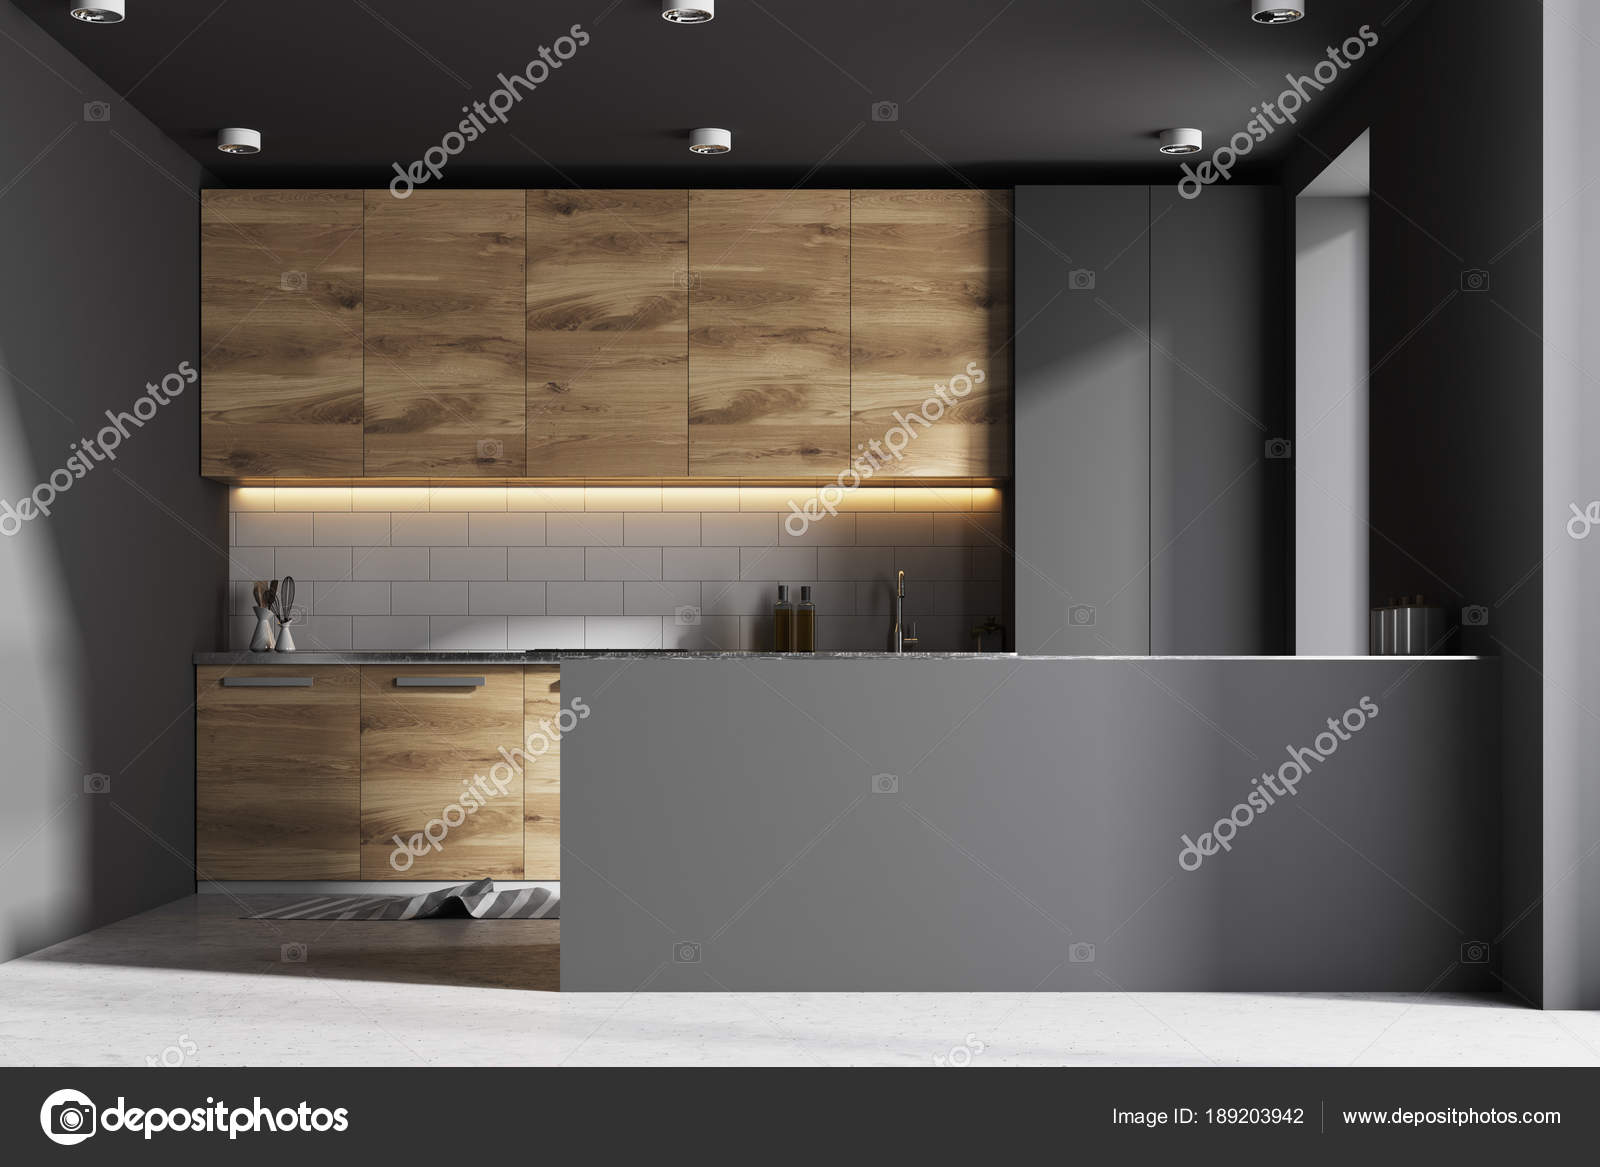 Grijs en houten interieur keukenbar u2014 stockfoto © denisismagilov